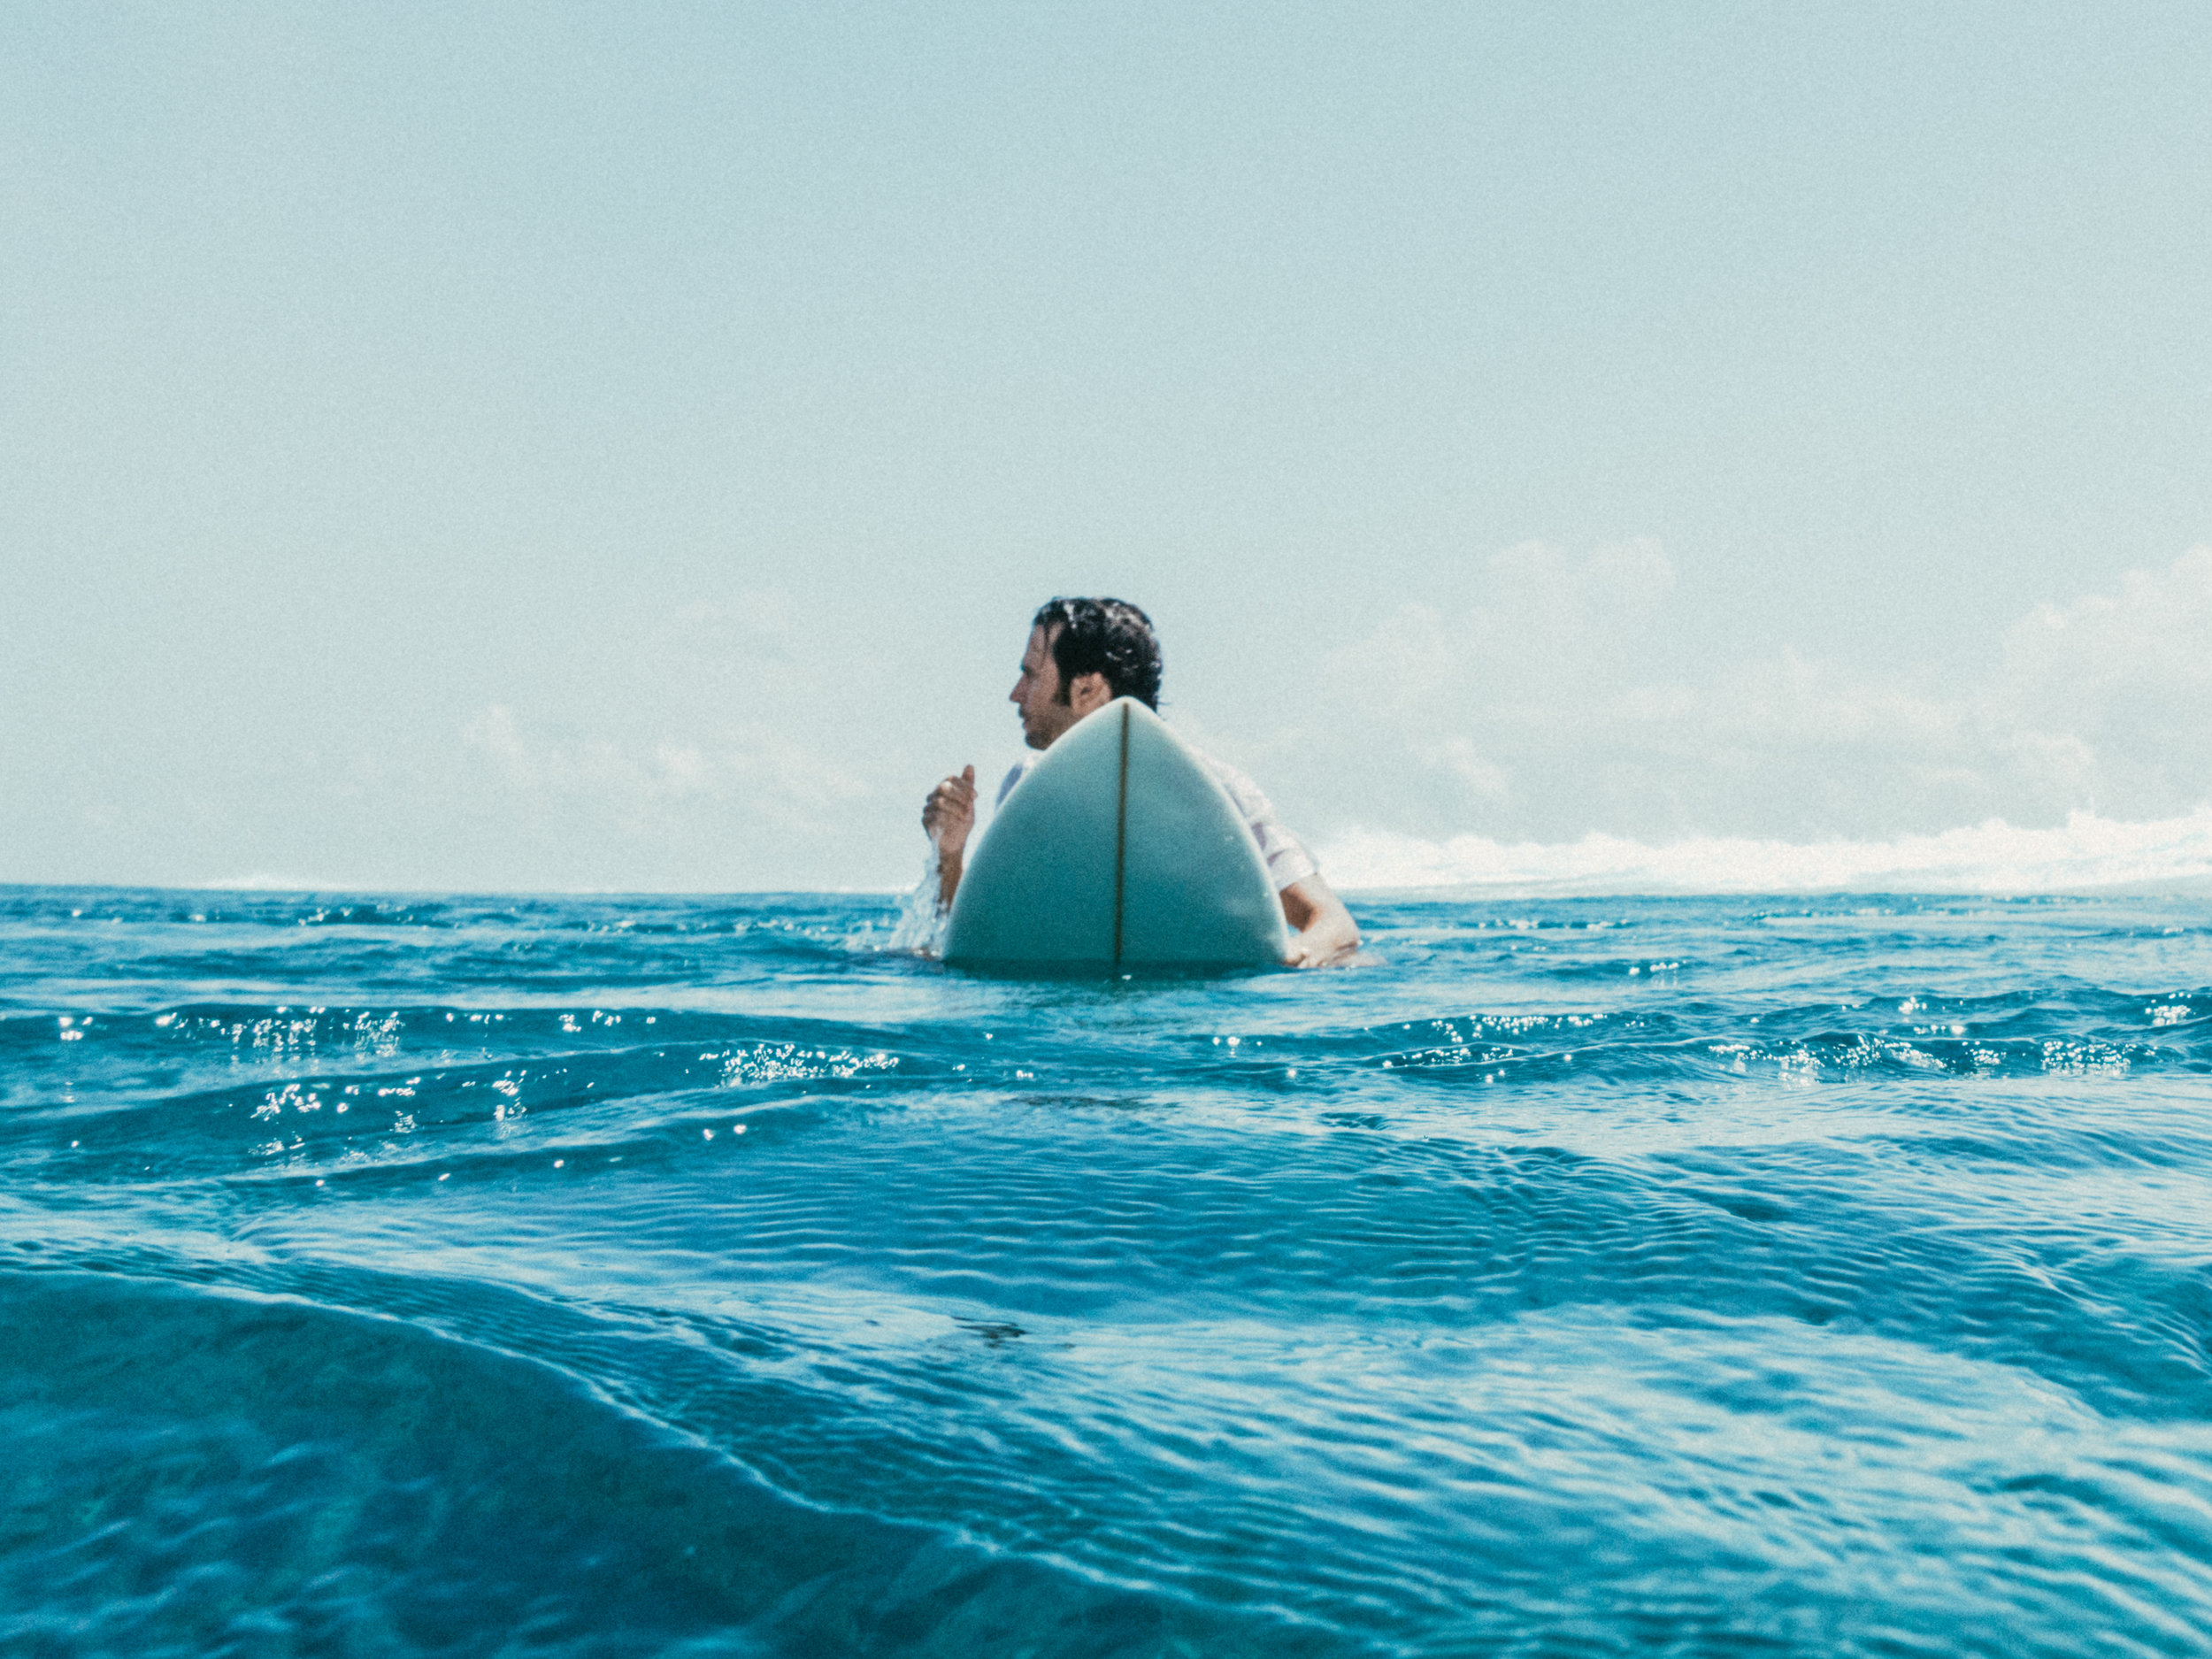 surf-13.jpg